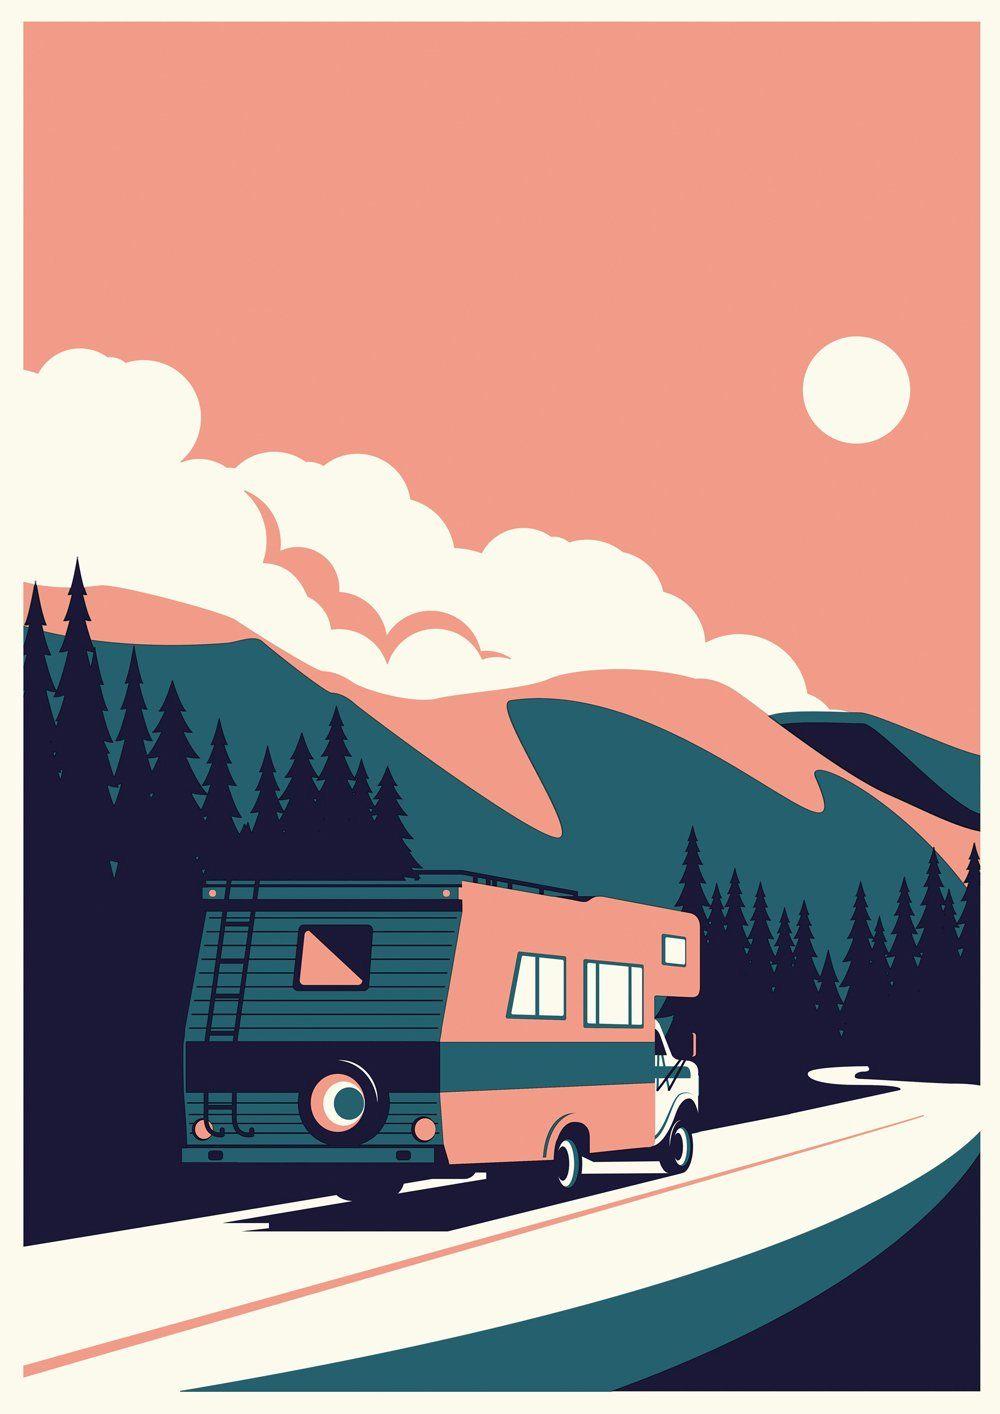 Summertime Travel - RV - Giclée print